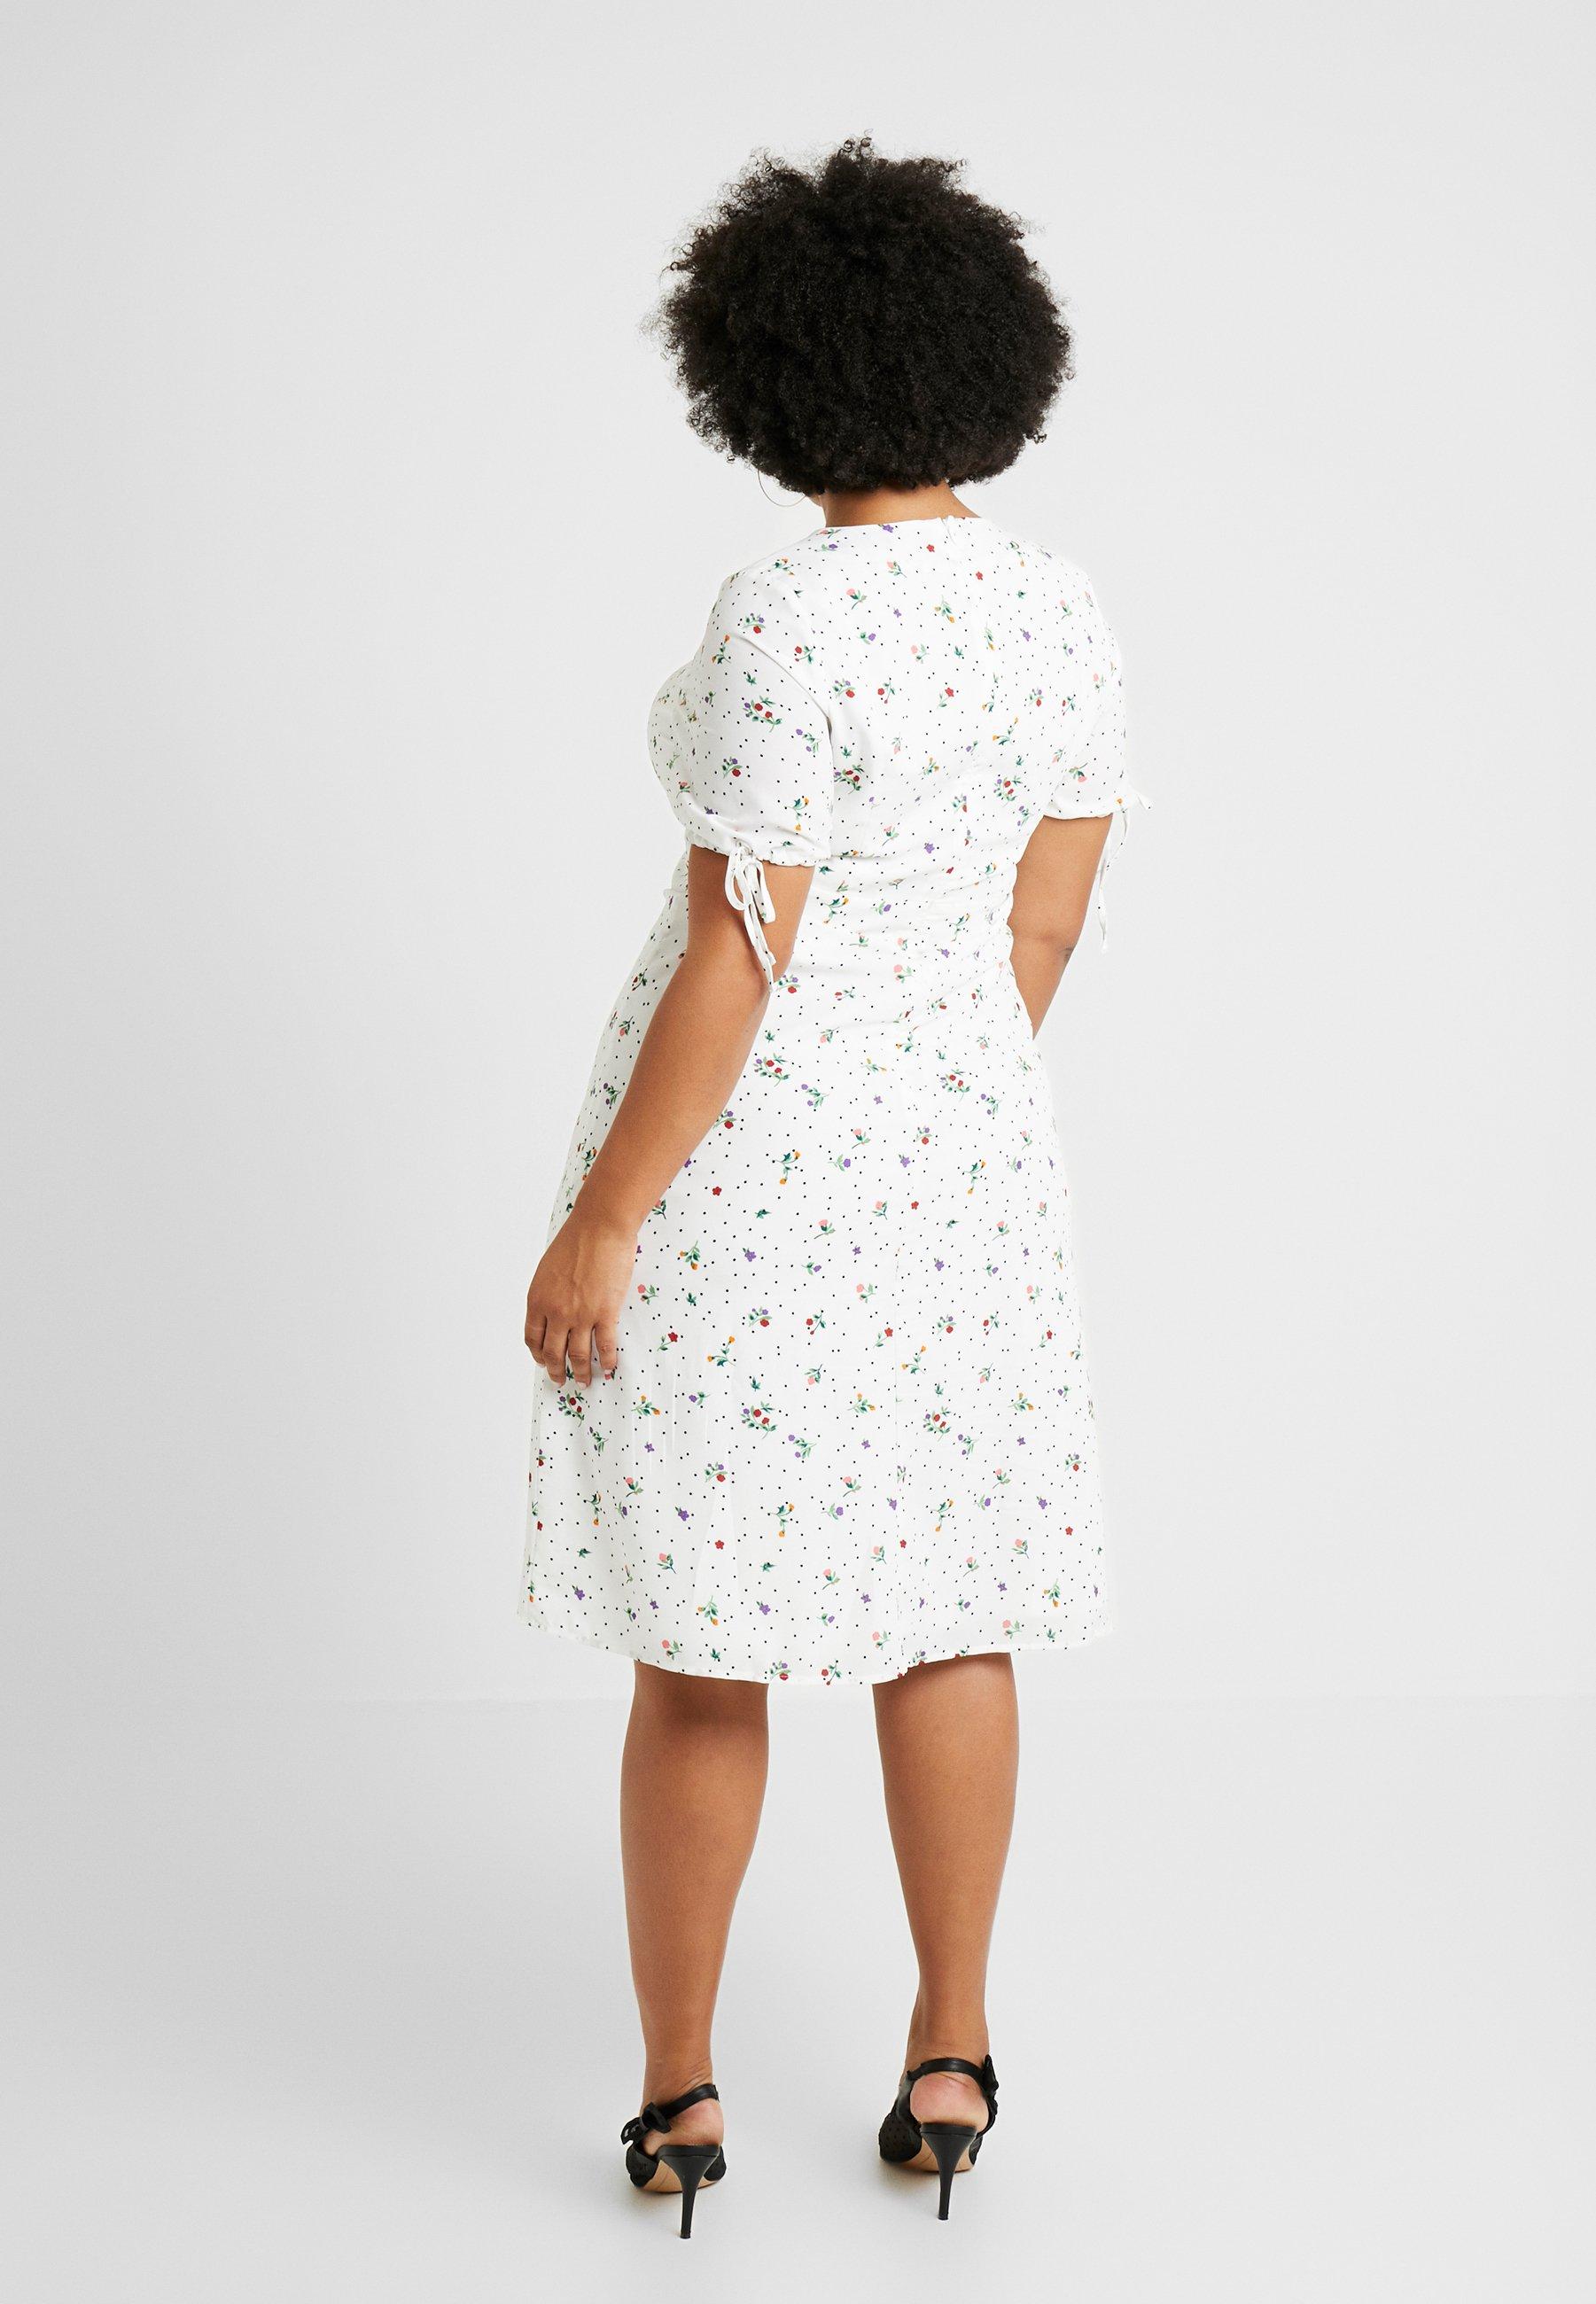 TiesRobe Sleeve Union With Midi White Fashion D'été Plus Dress BWCreQxdo